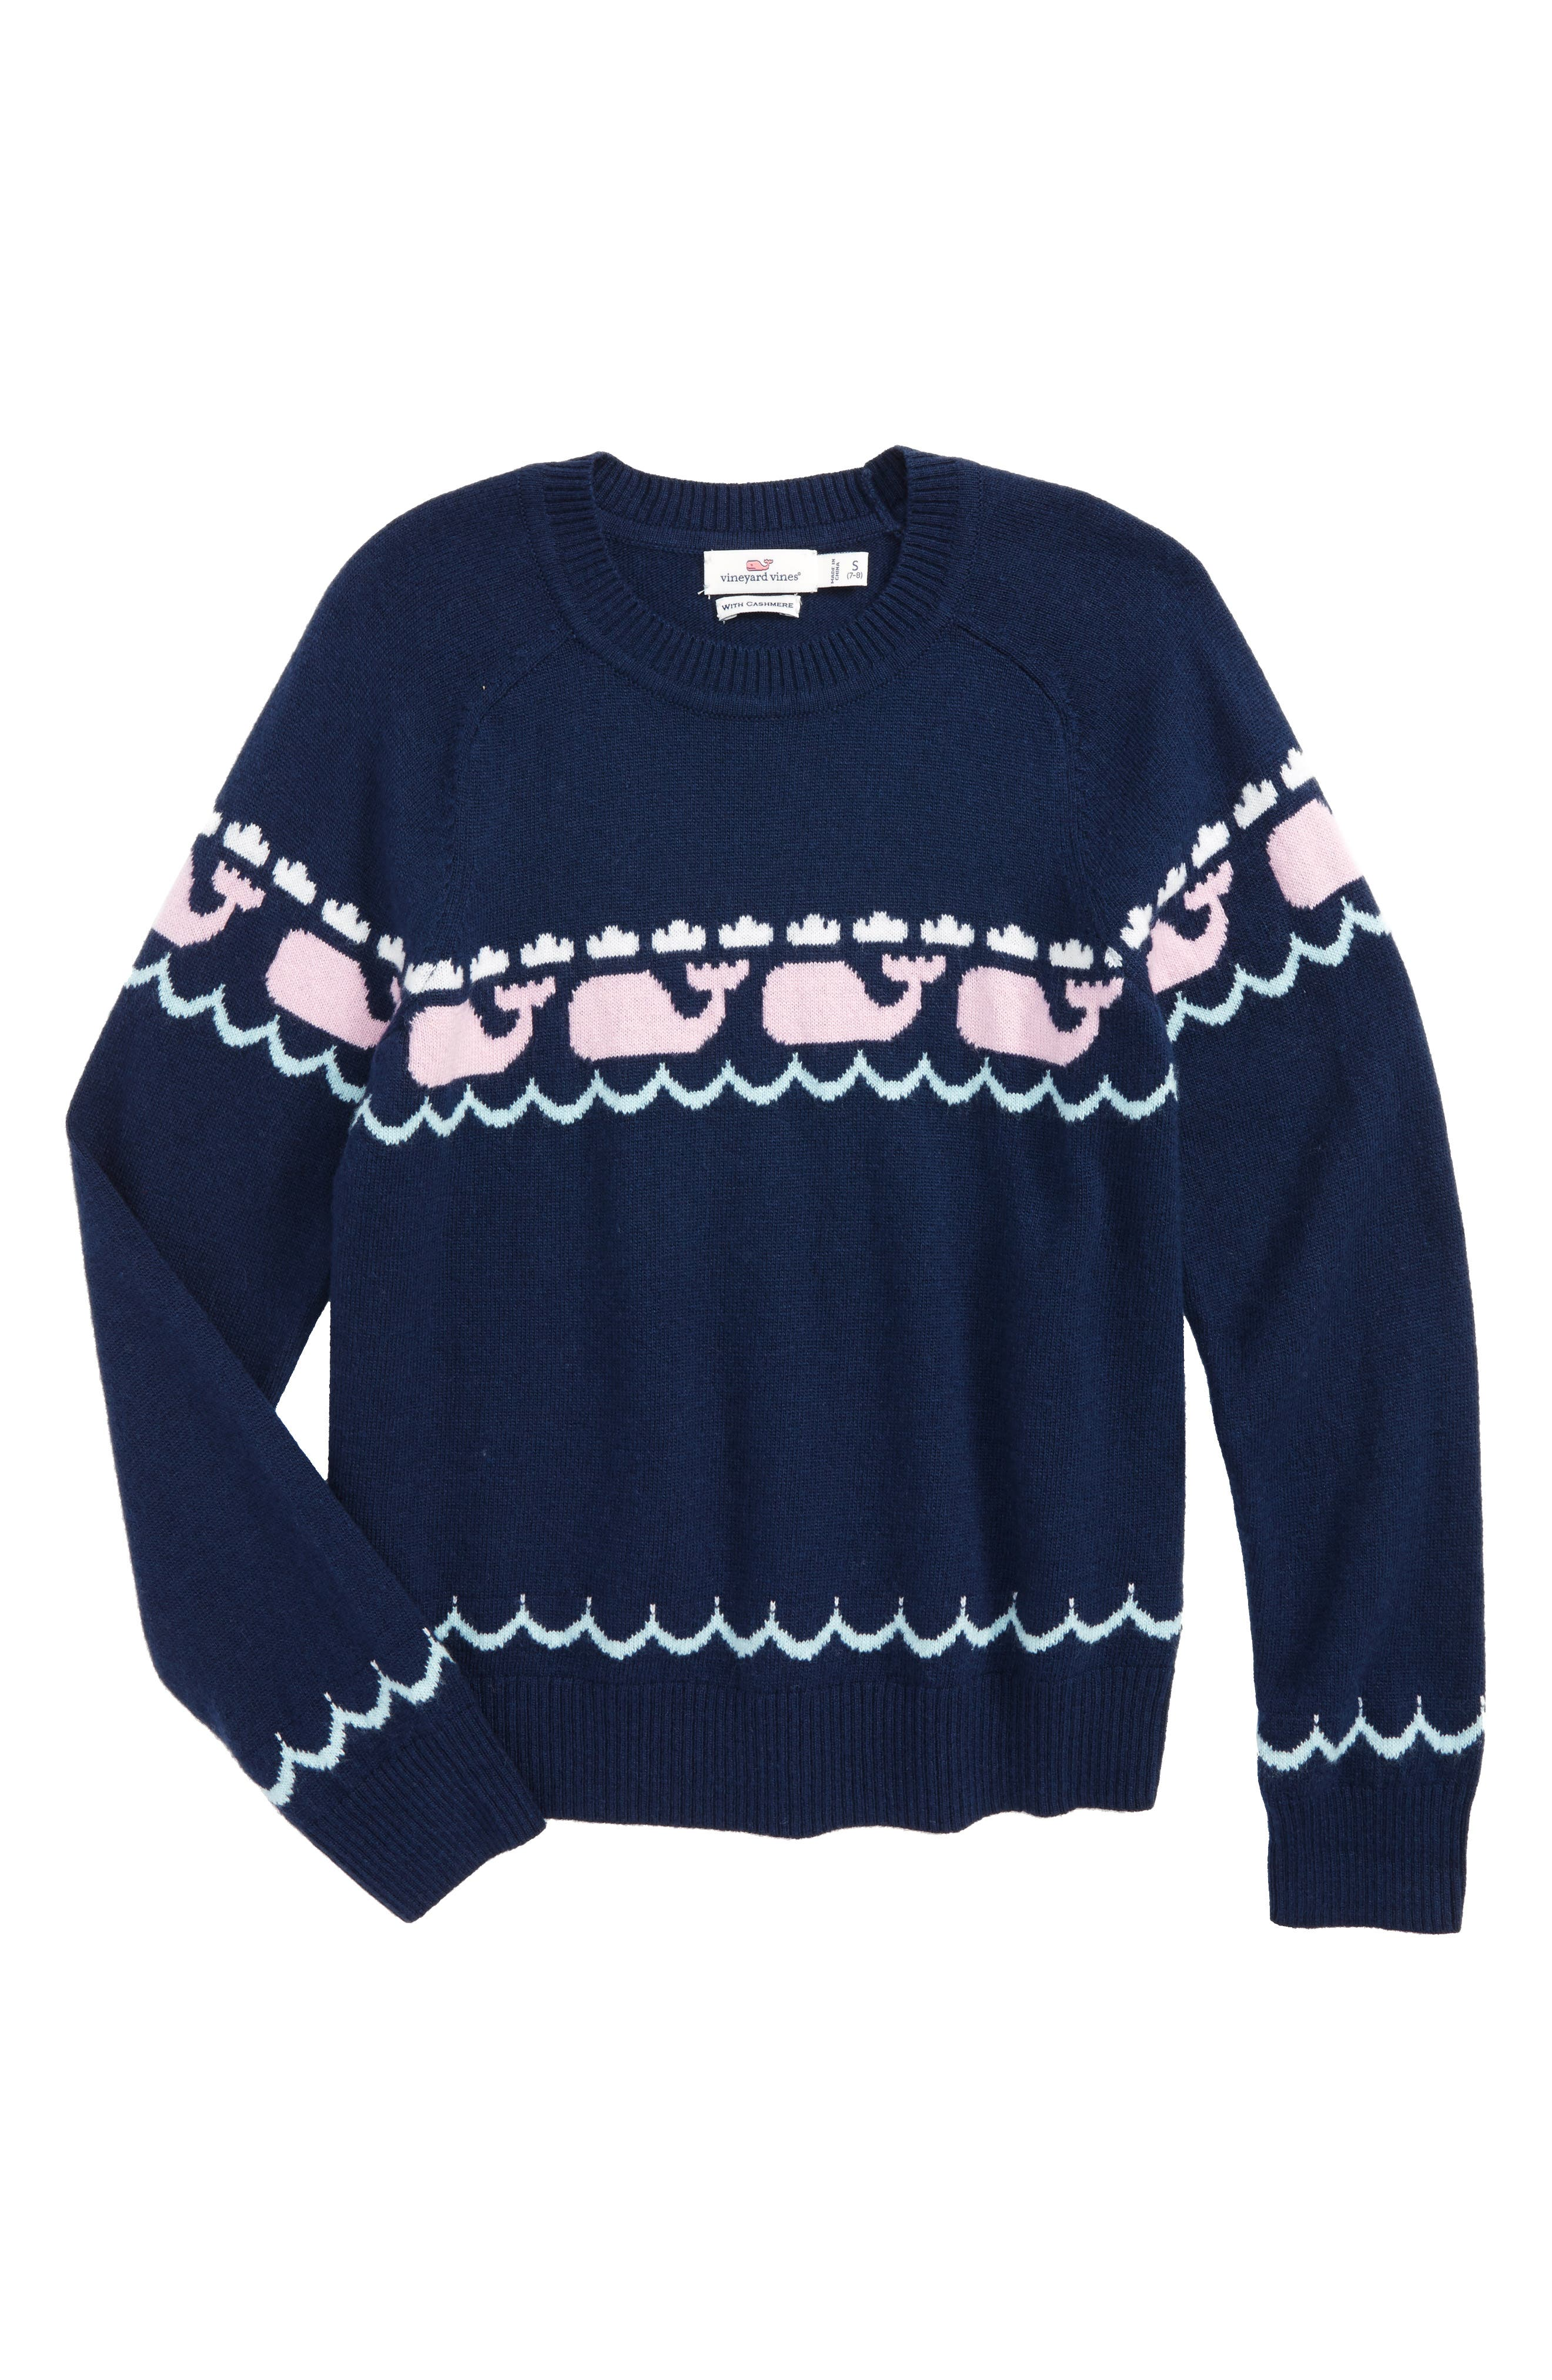 Whale Intarsia Sweater,                             Main thumbnail 1, color,                             406